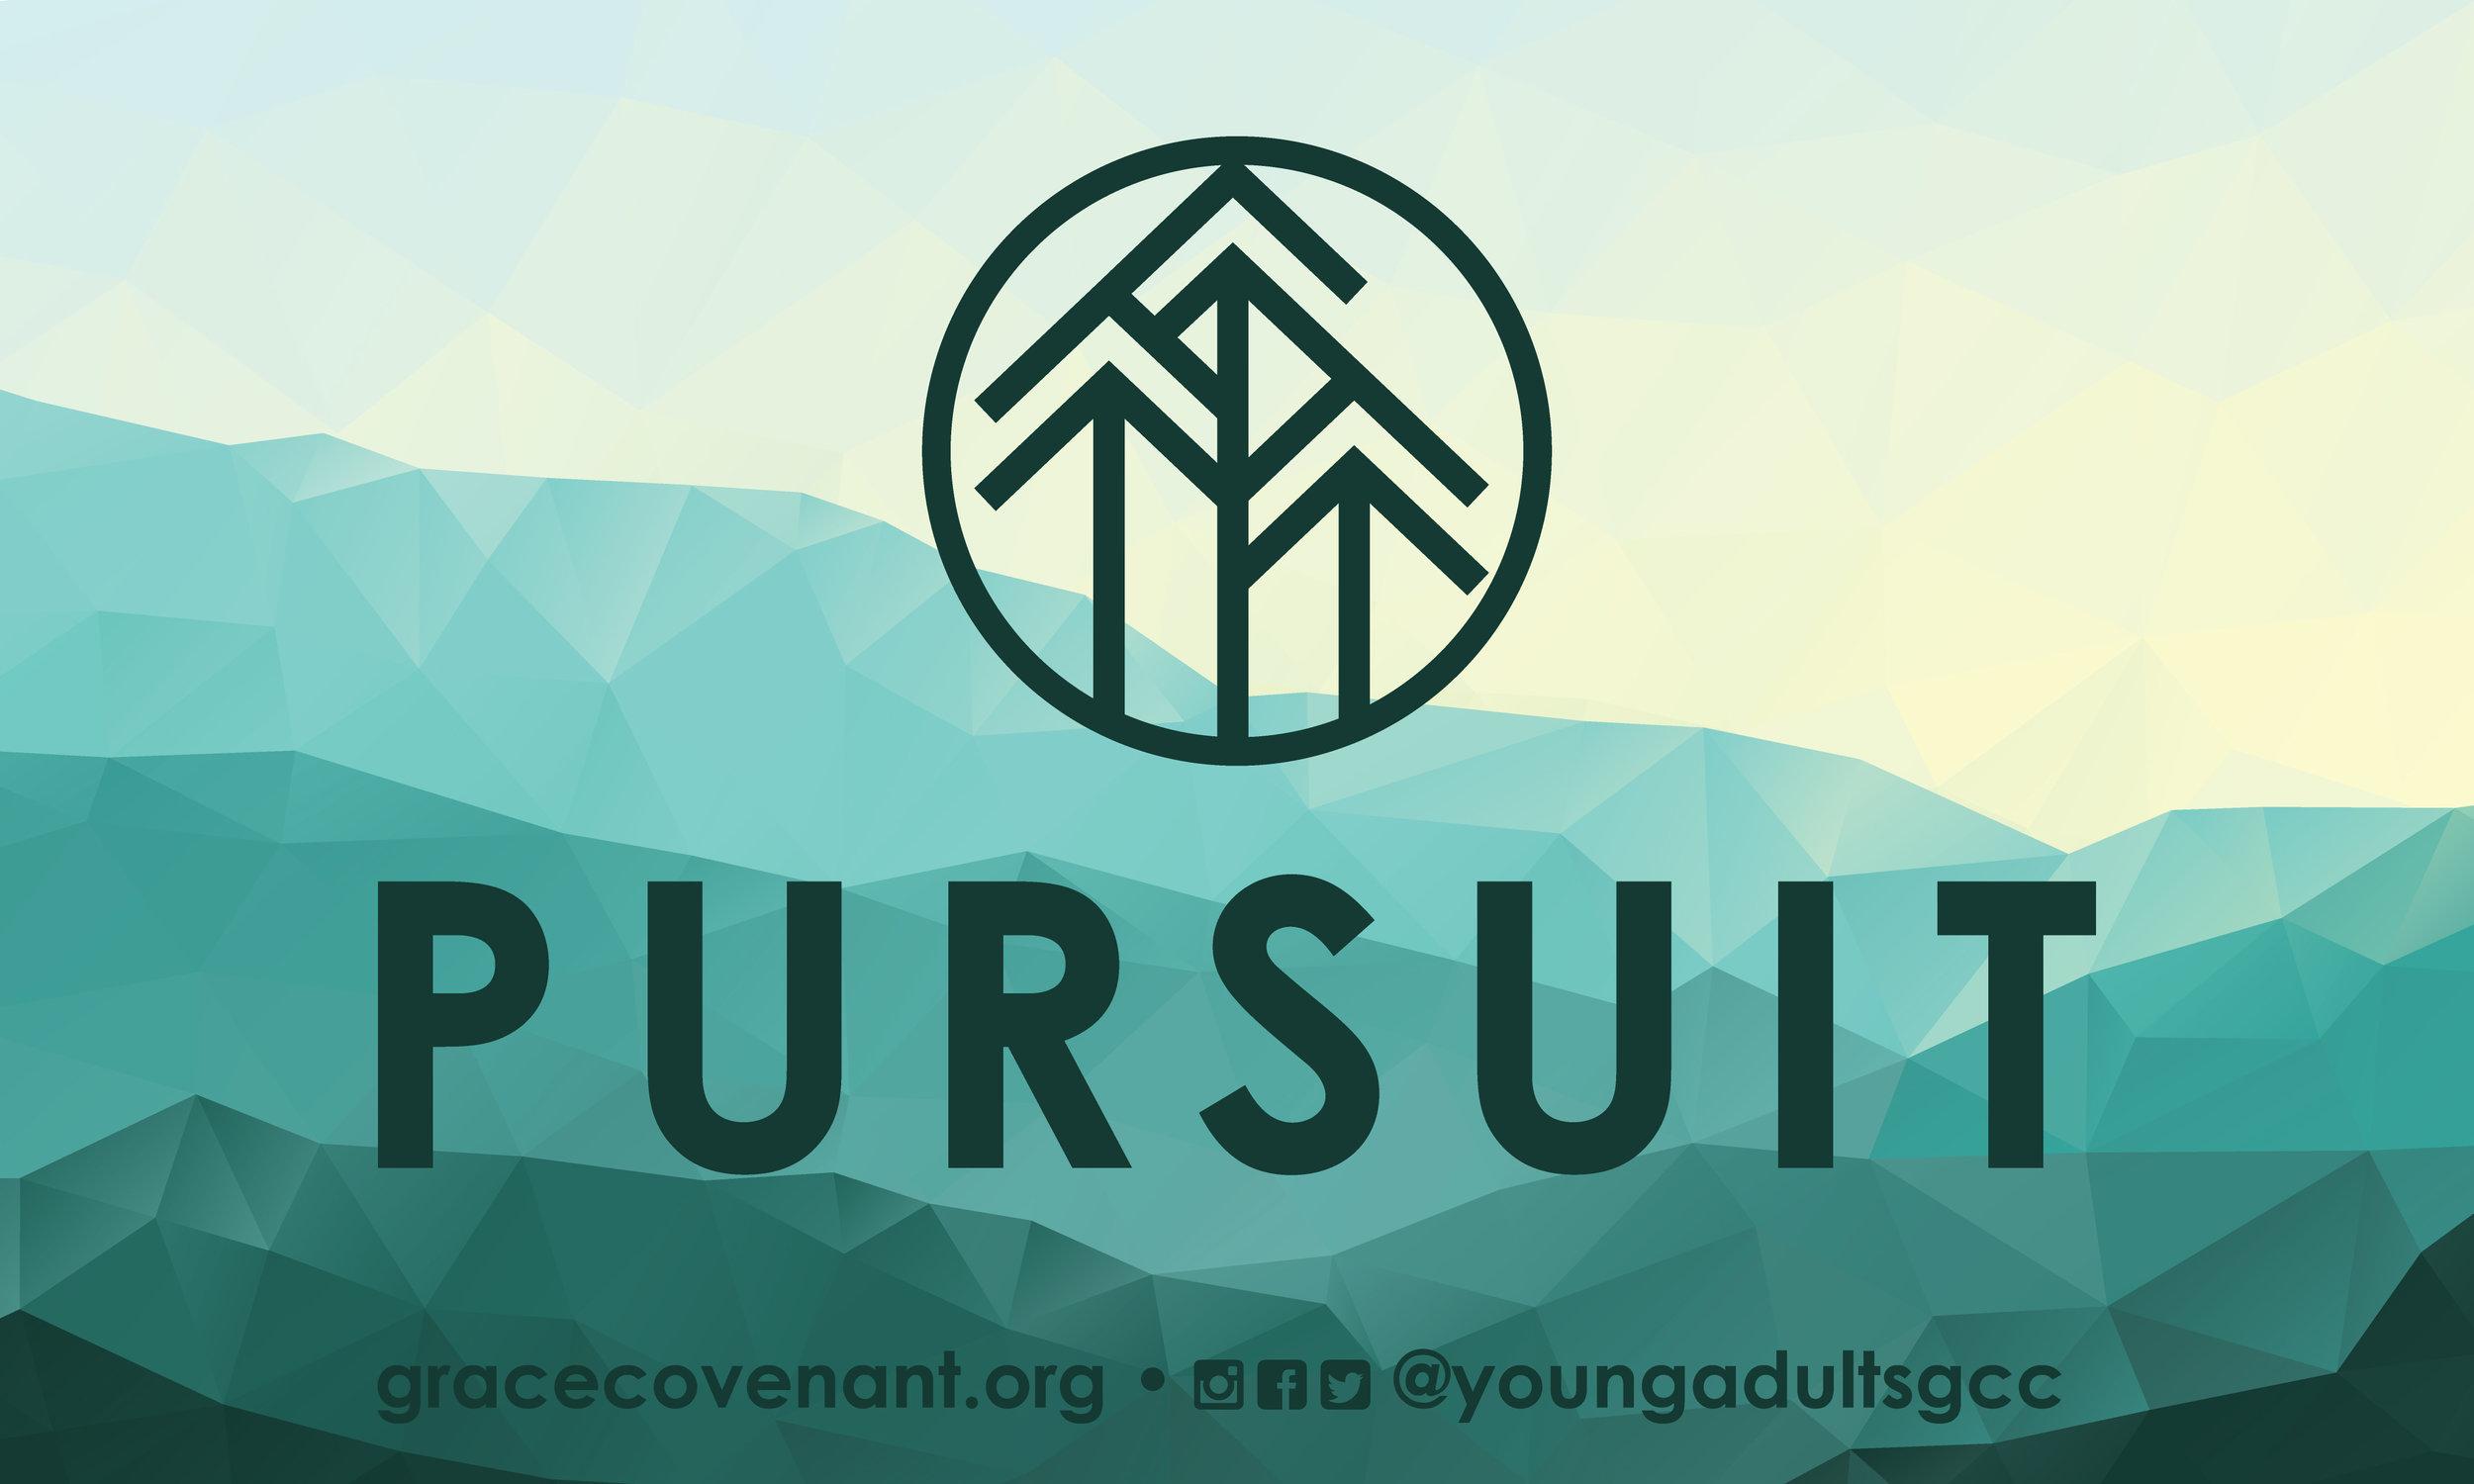 pursuit_banner.jpg